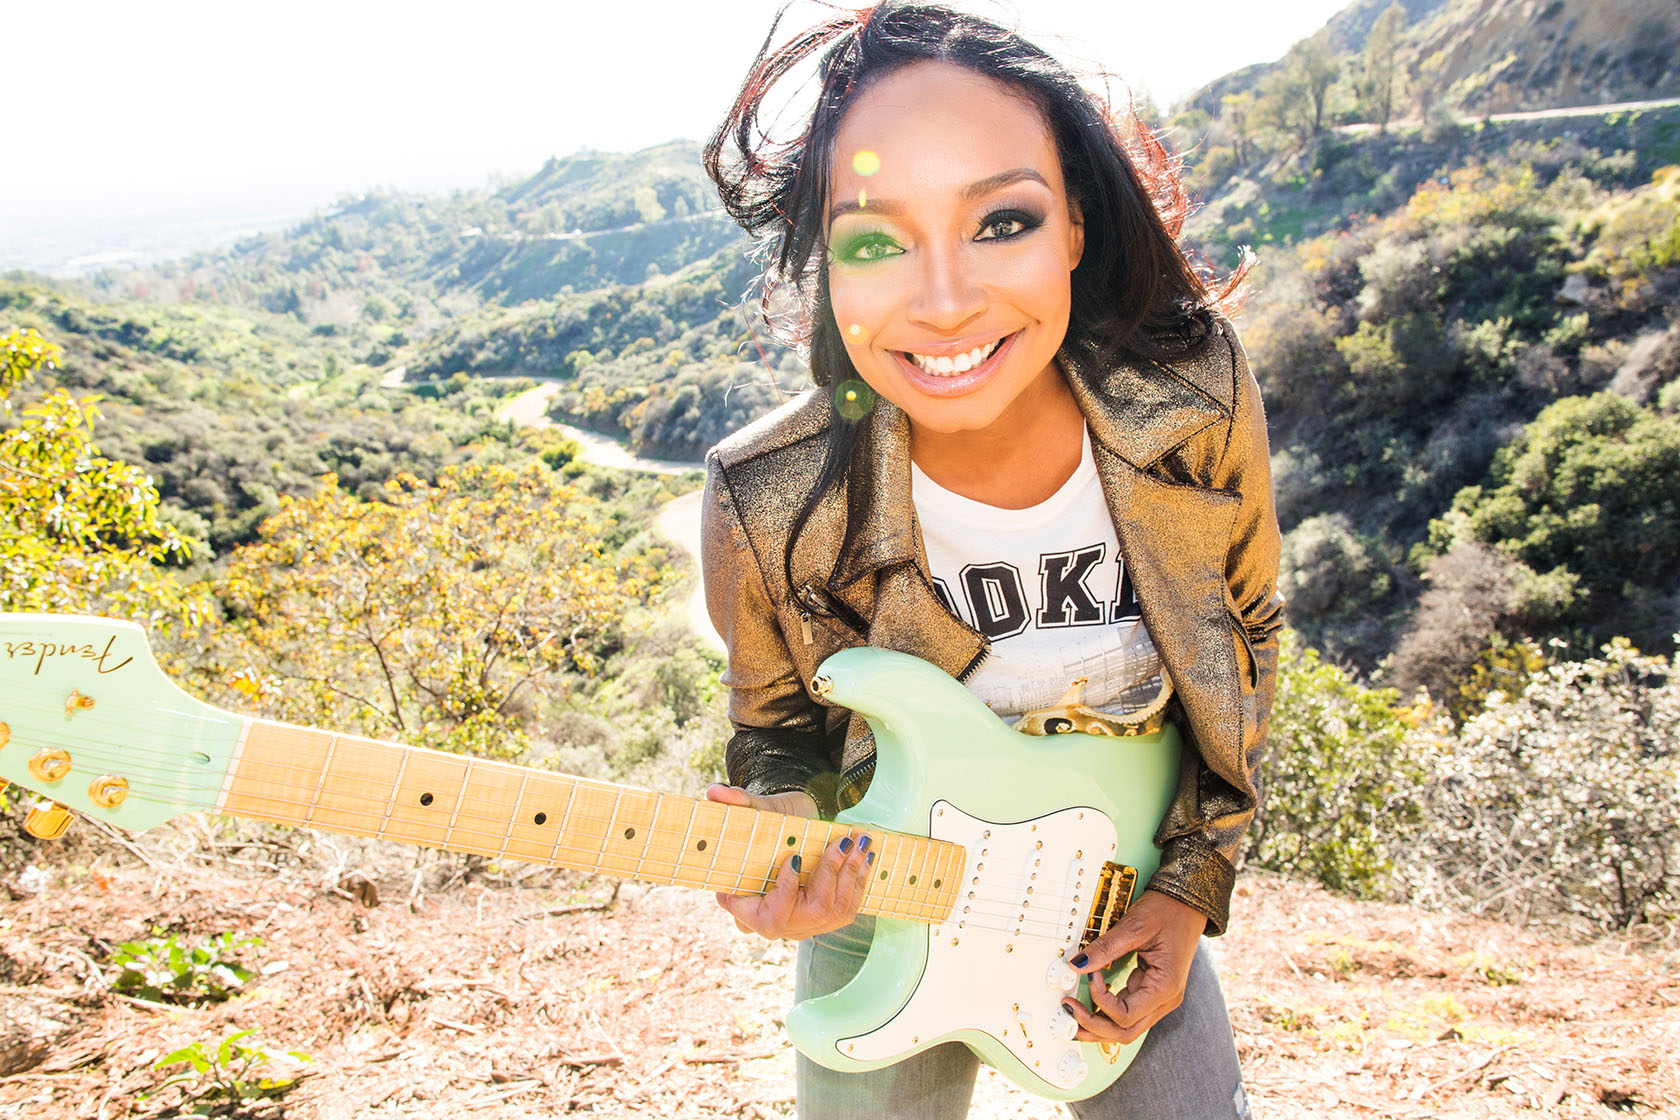 Guitar Maven Malina Moye Releases New Single, Hitting Billboard Charts in First Week